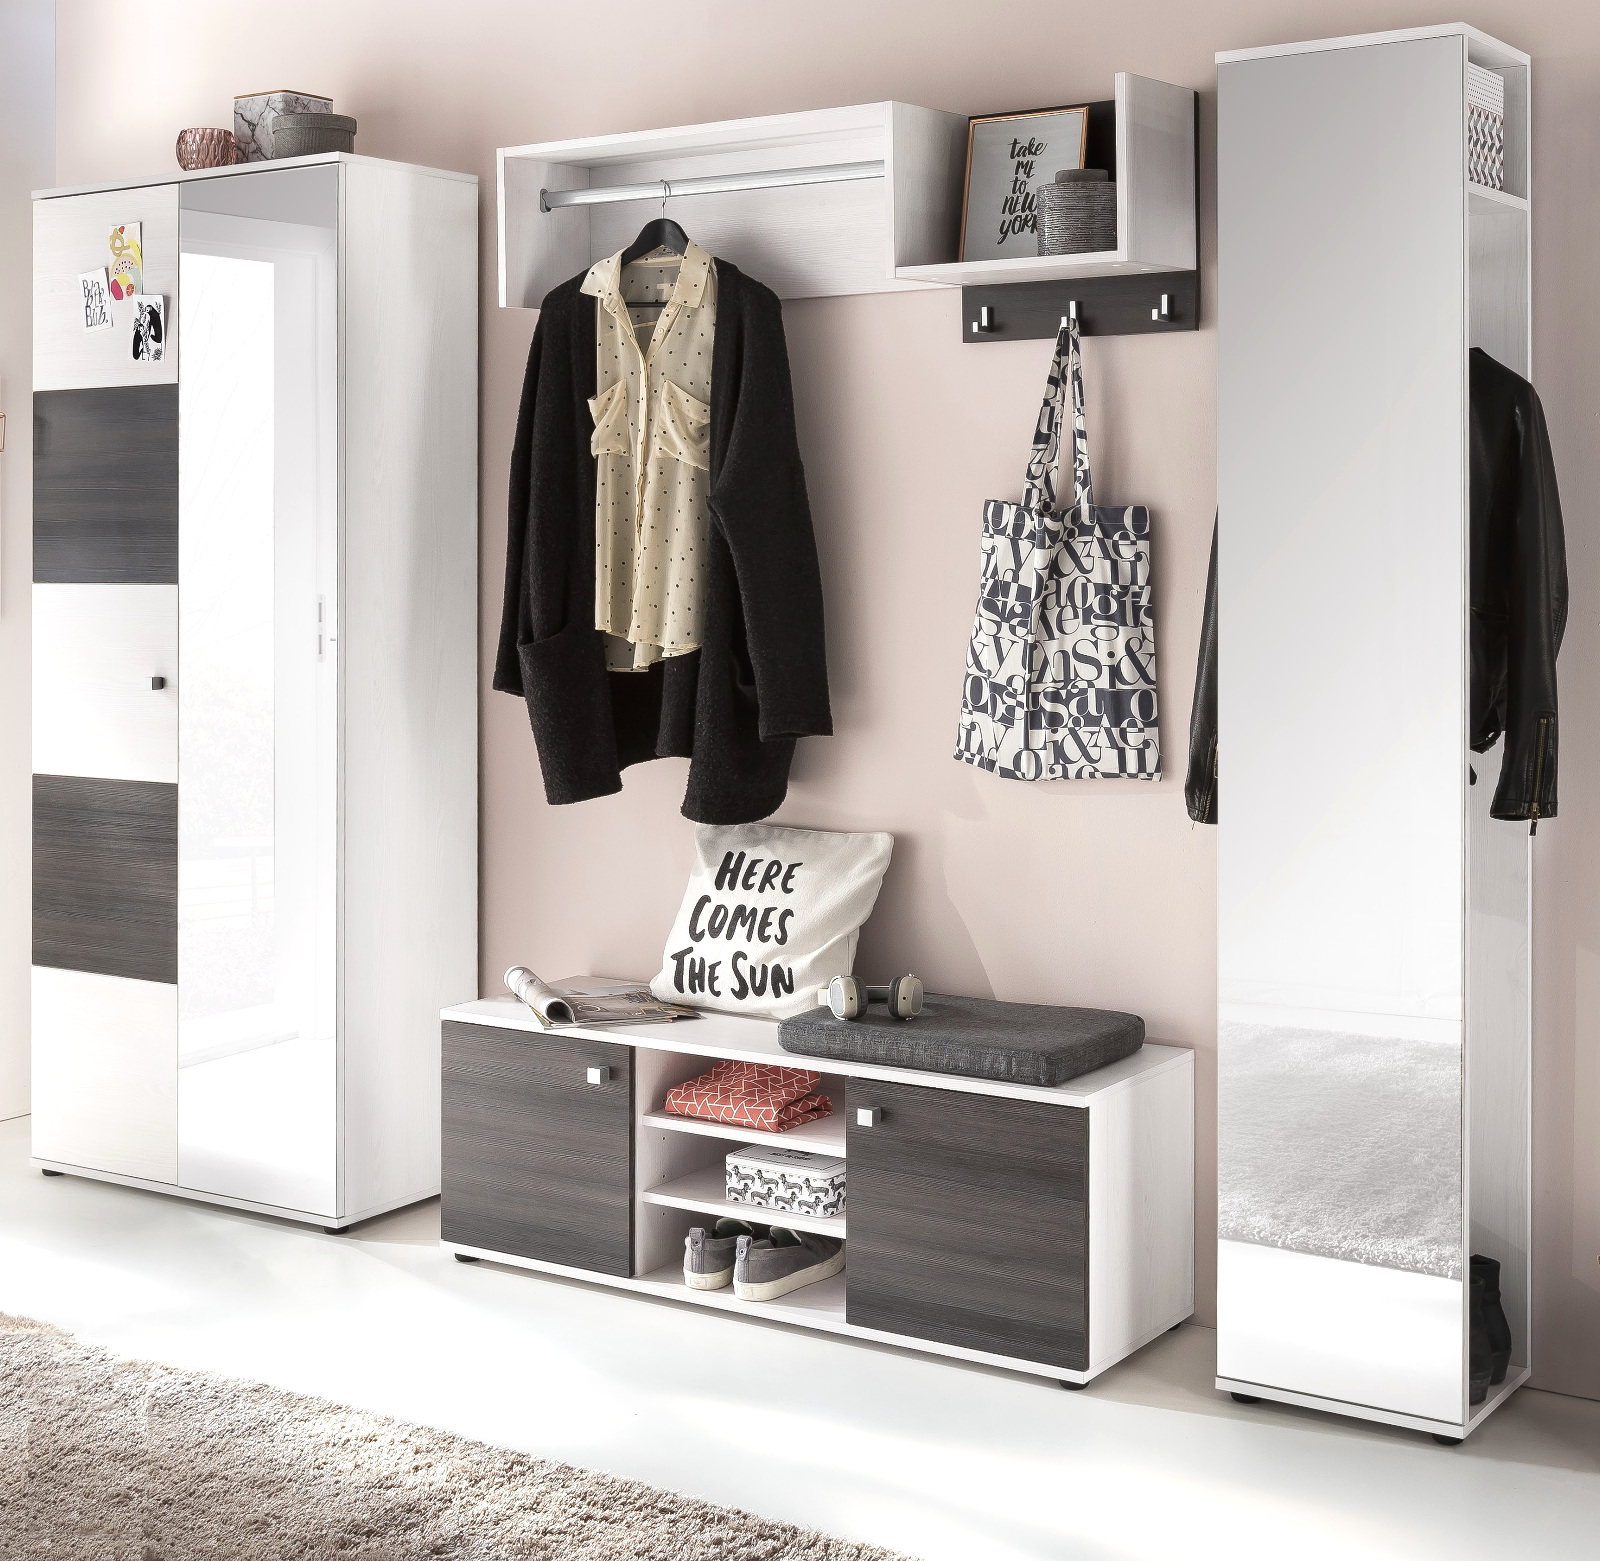 flur garderobe wandgarderobe sibu l rche wei kleiderstange ablage haken wings ebay. Black Bedroom Furniture Sets. Home Design Ideas